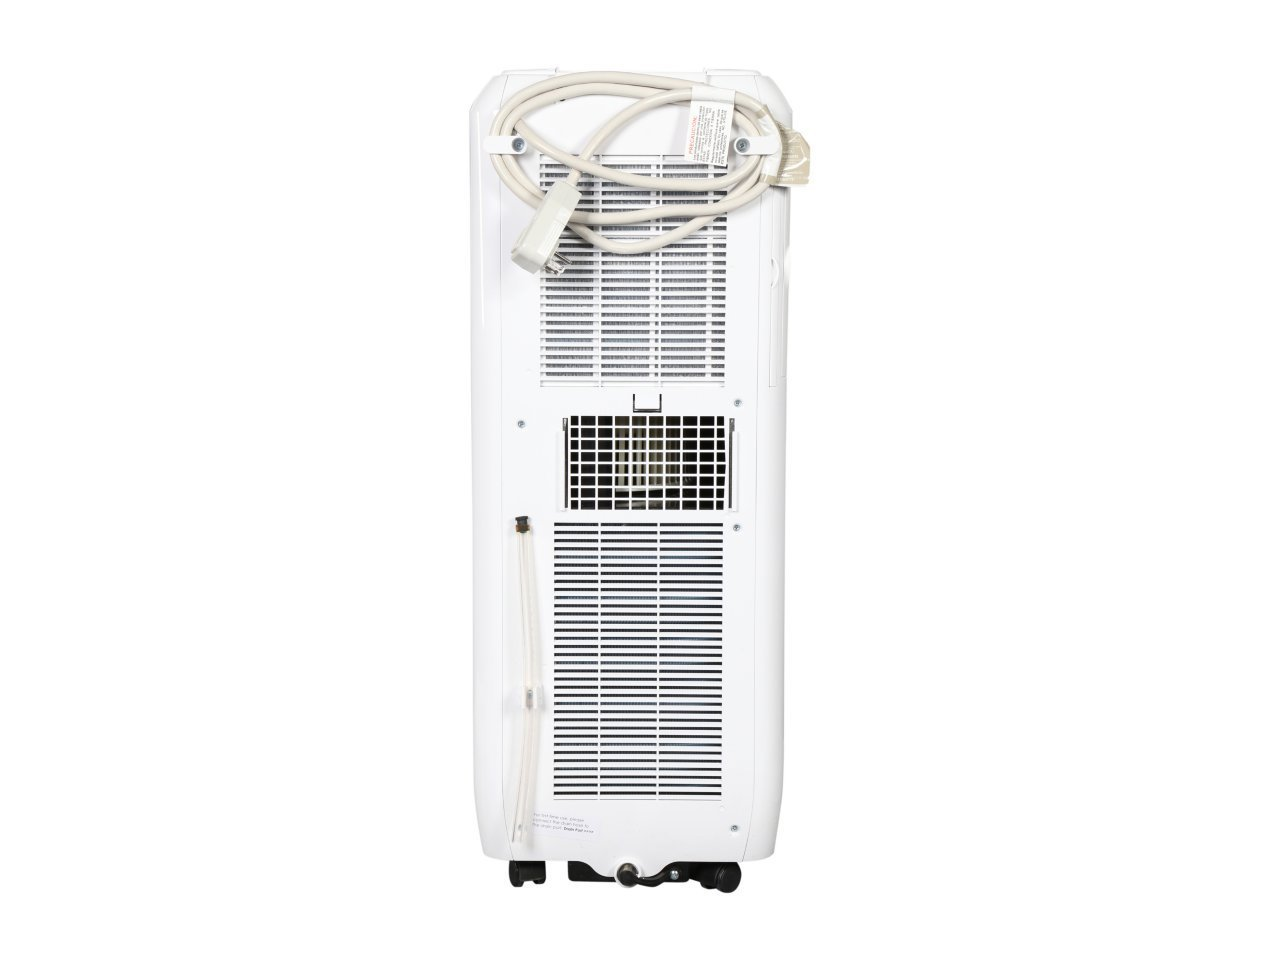 Soleus Air MobilComfort KY 80E9 8,000 BTU 3 In 1 Portable Air Conditioner,  Dehumidifier And Fan